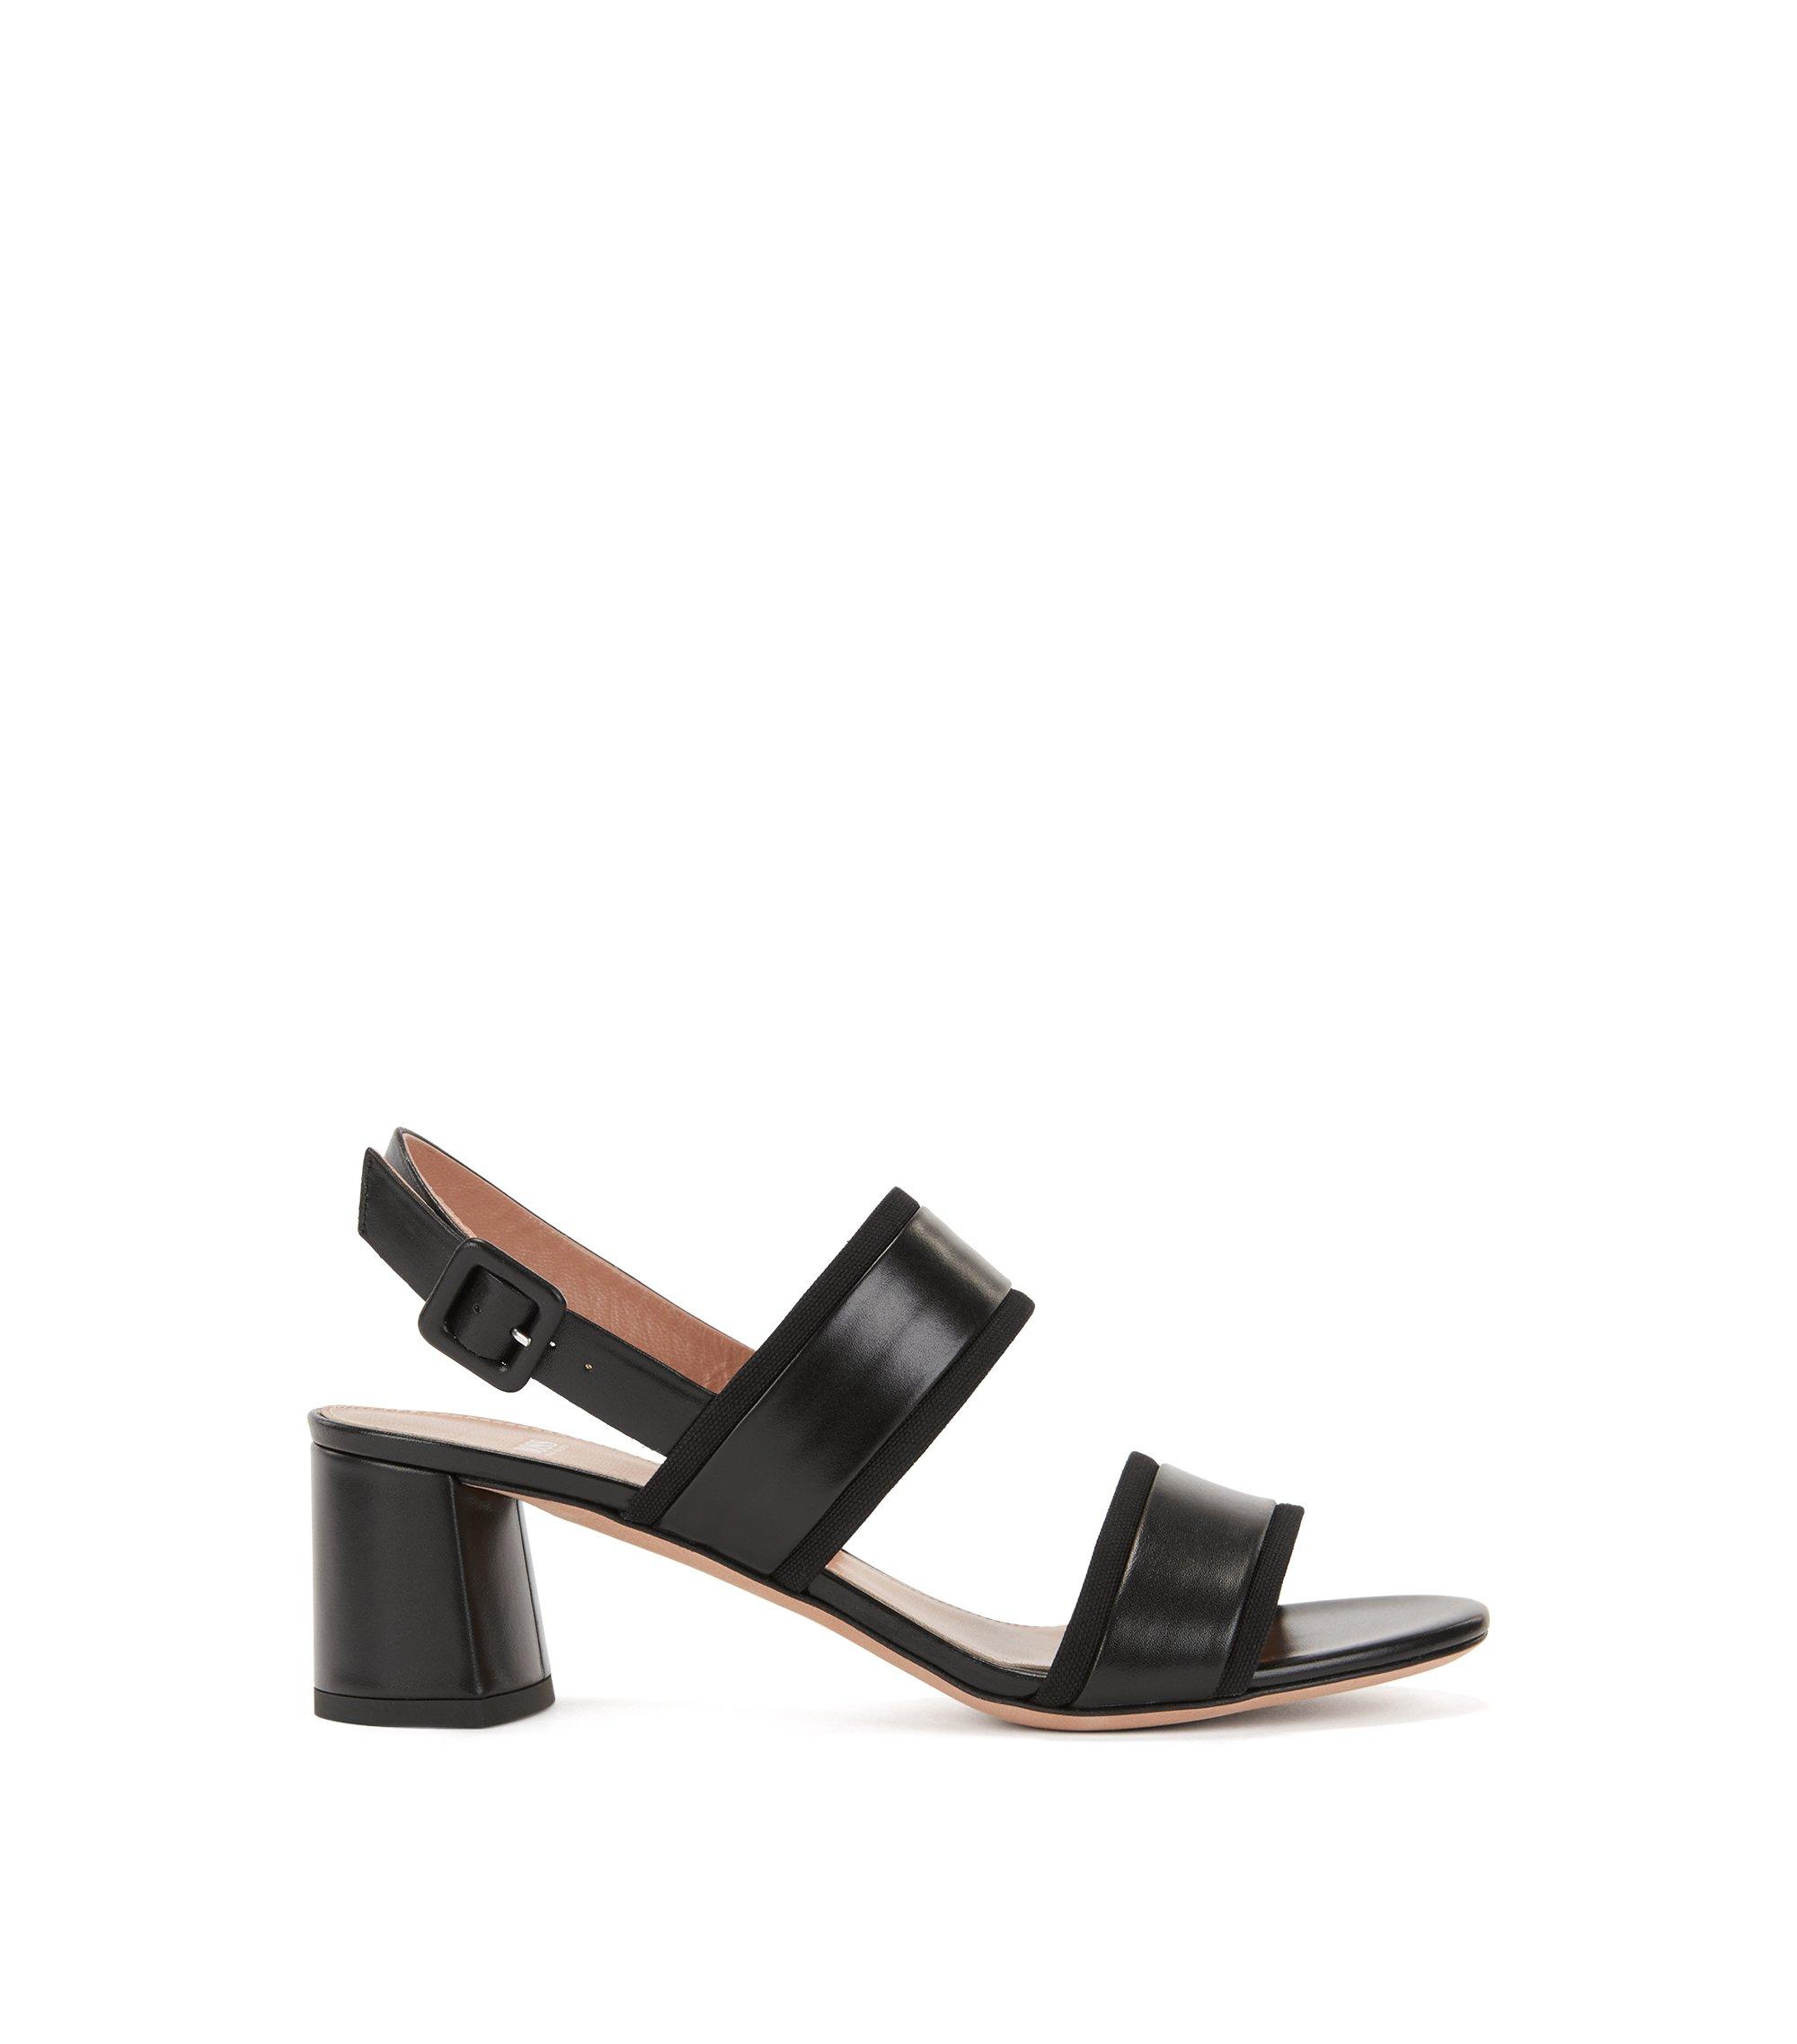 Leather Sandal | Adrienne Sandal, Black